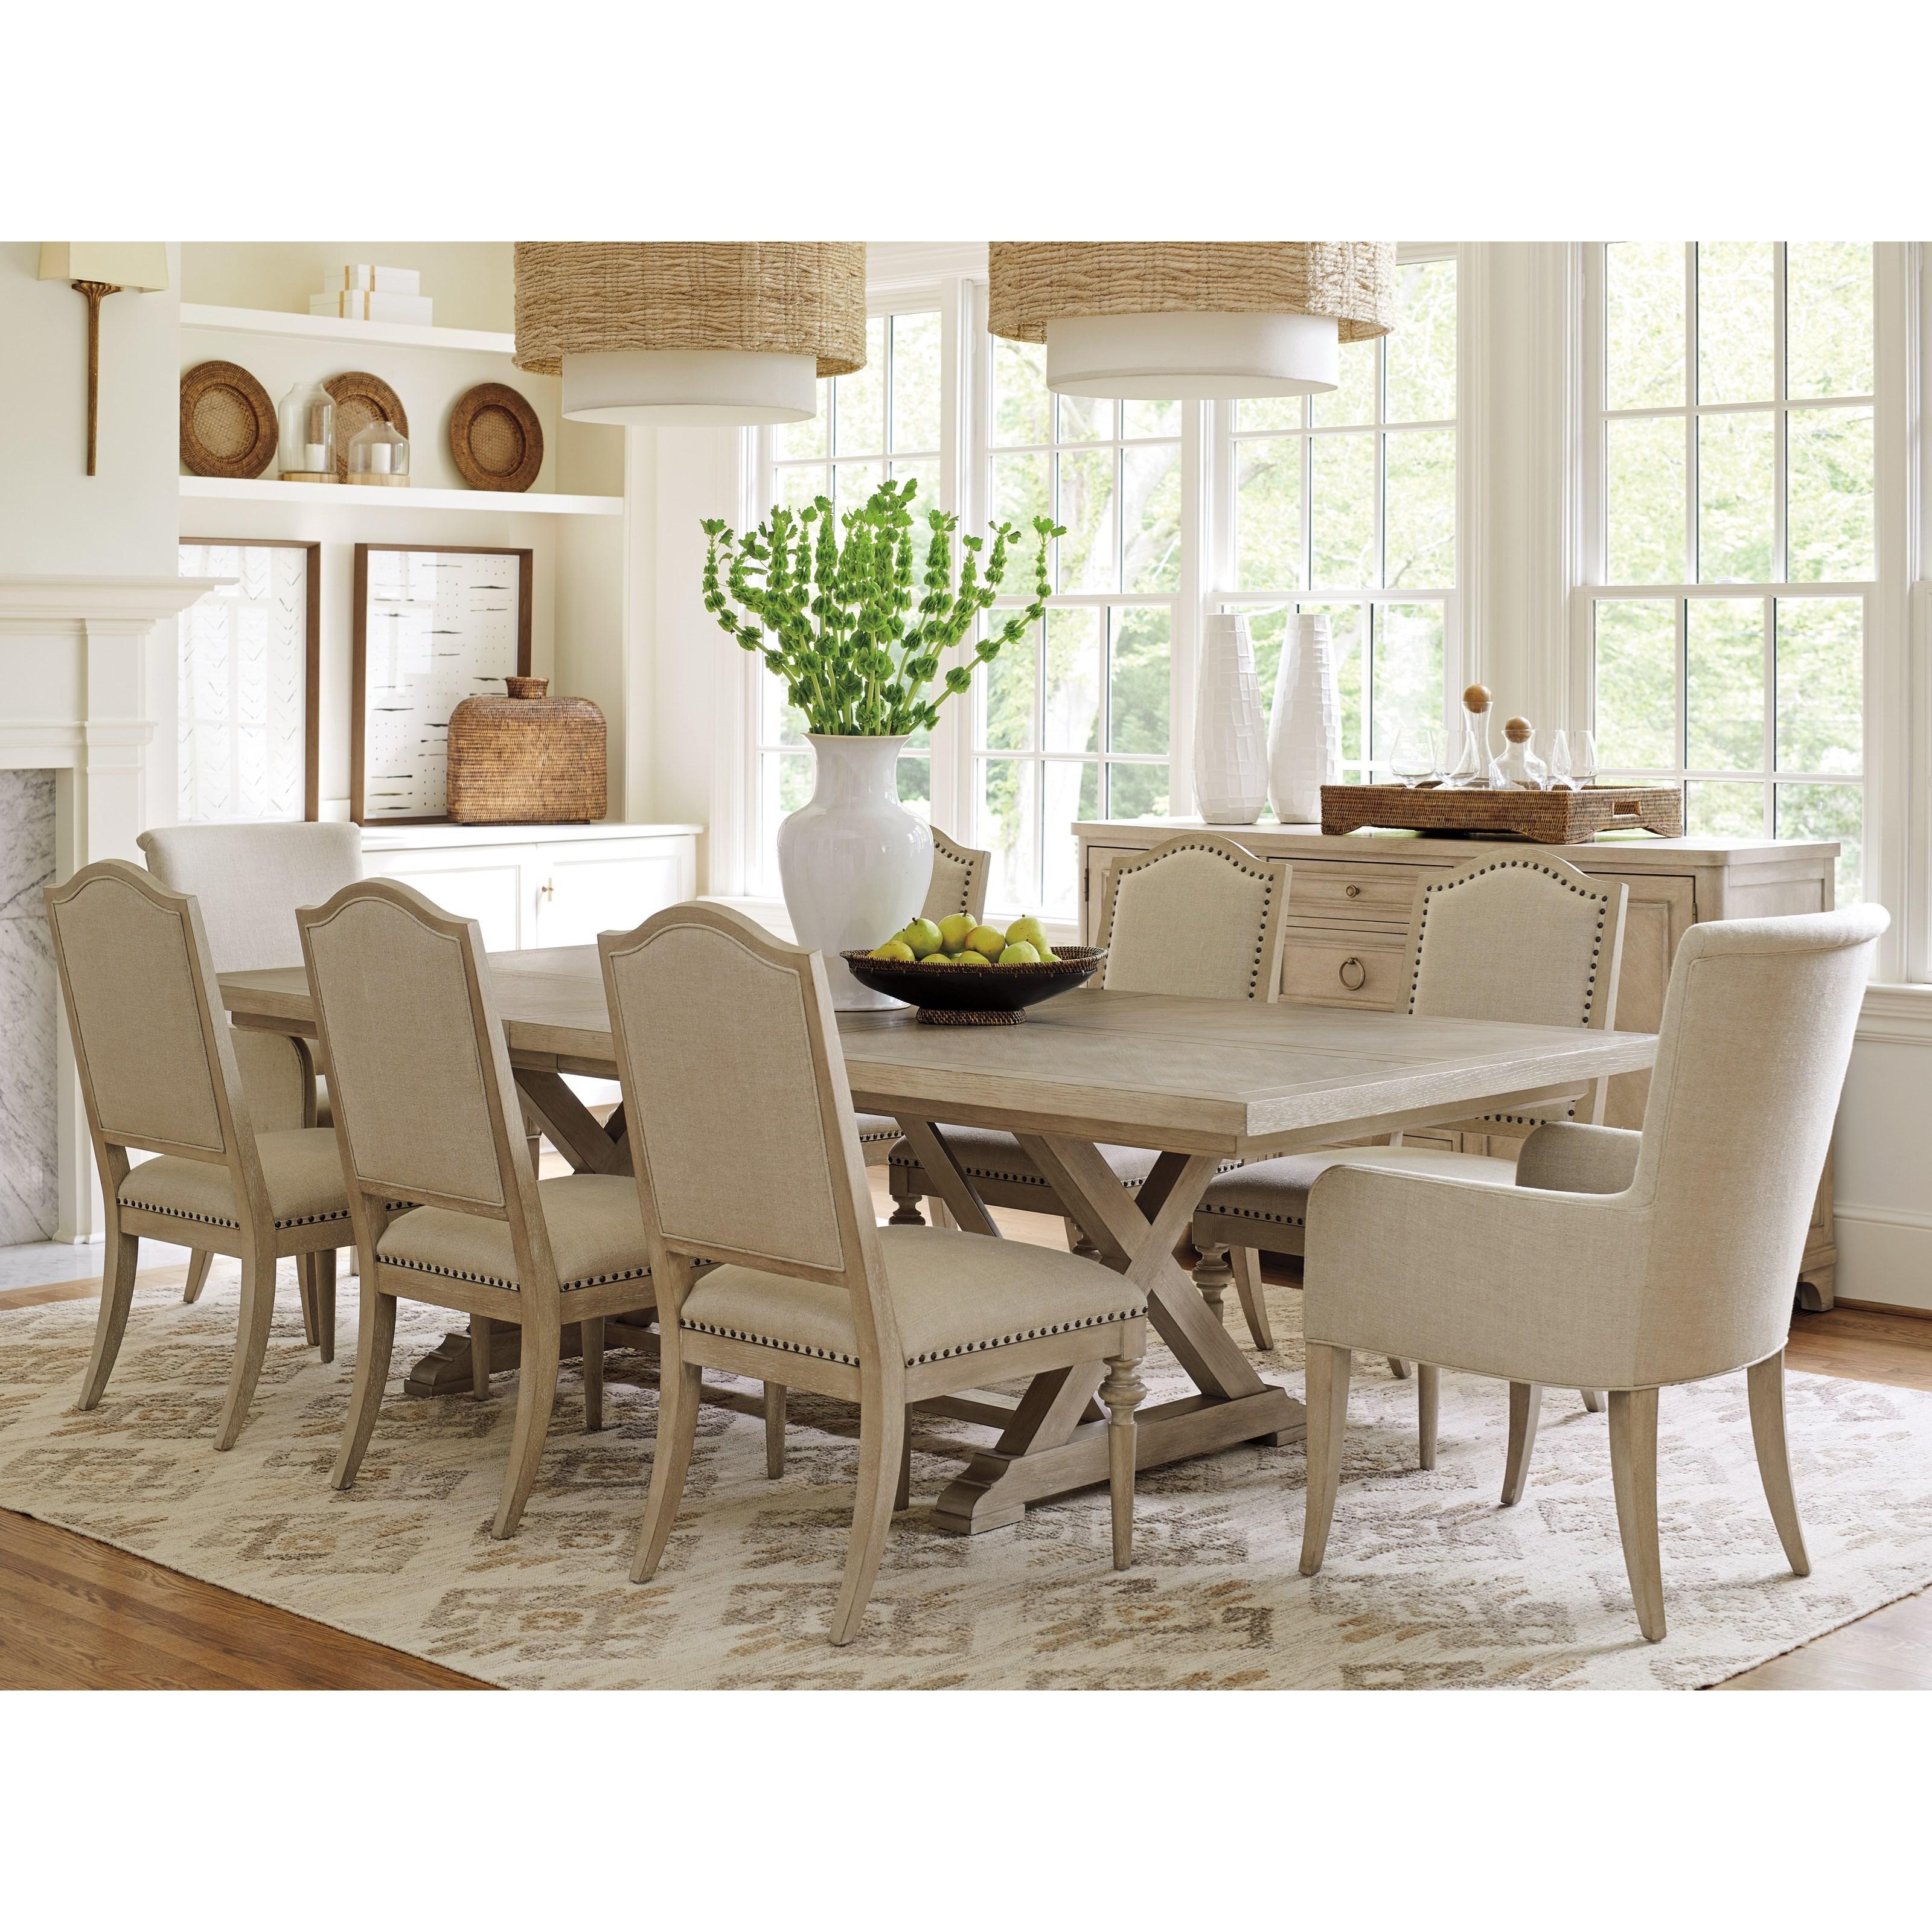 Barclay Butera Malibu 926 Dining Room Group 3 Formal Dining Group Baer S Furniture Formal Dining Room Groups